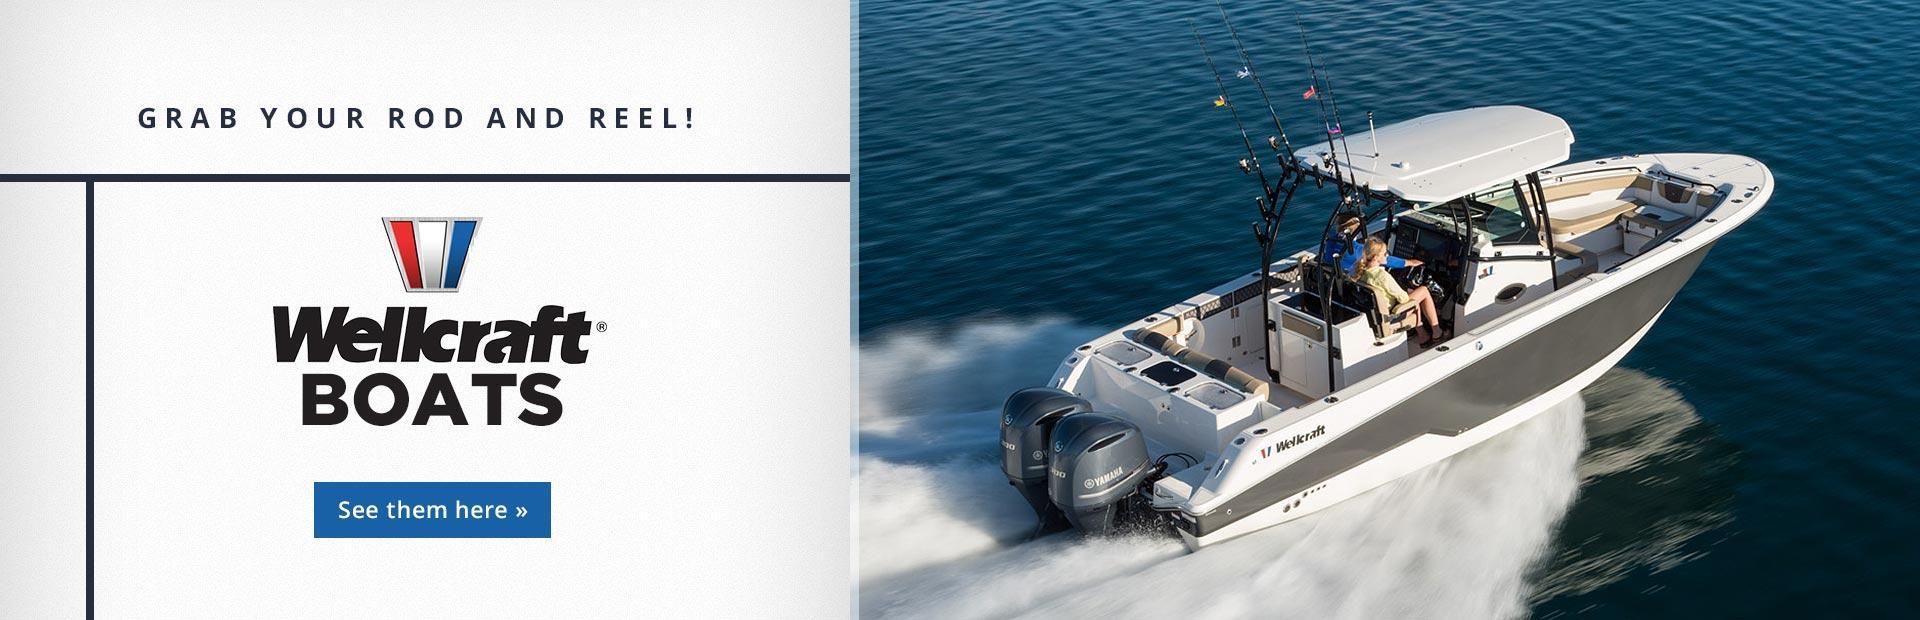 Nautical Marine image 1